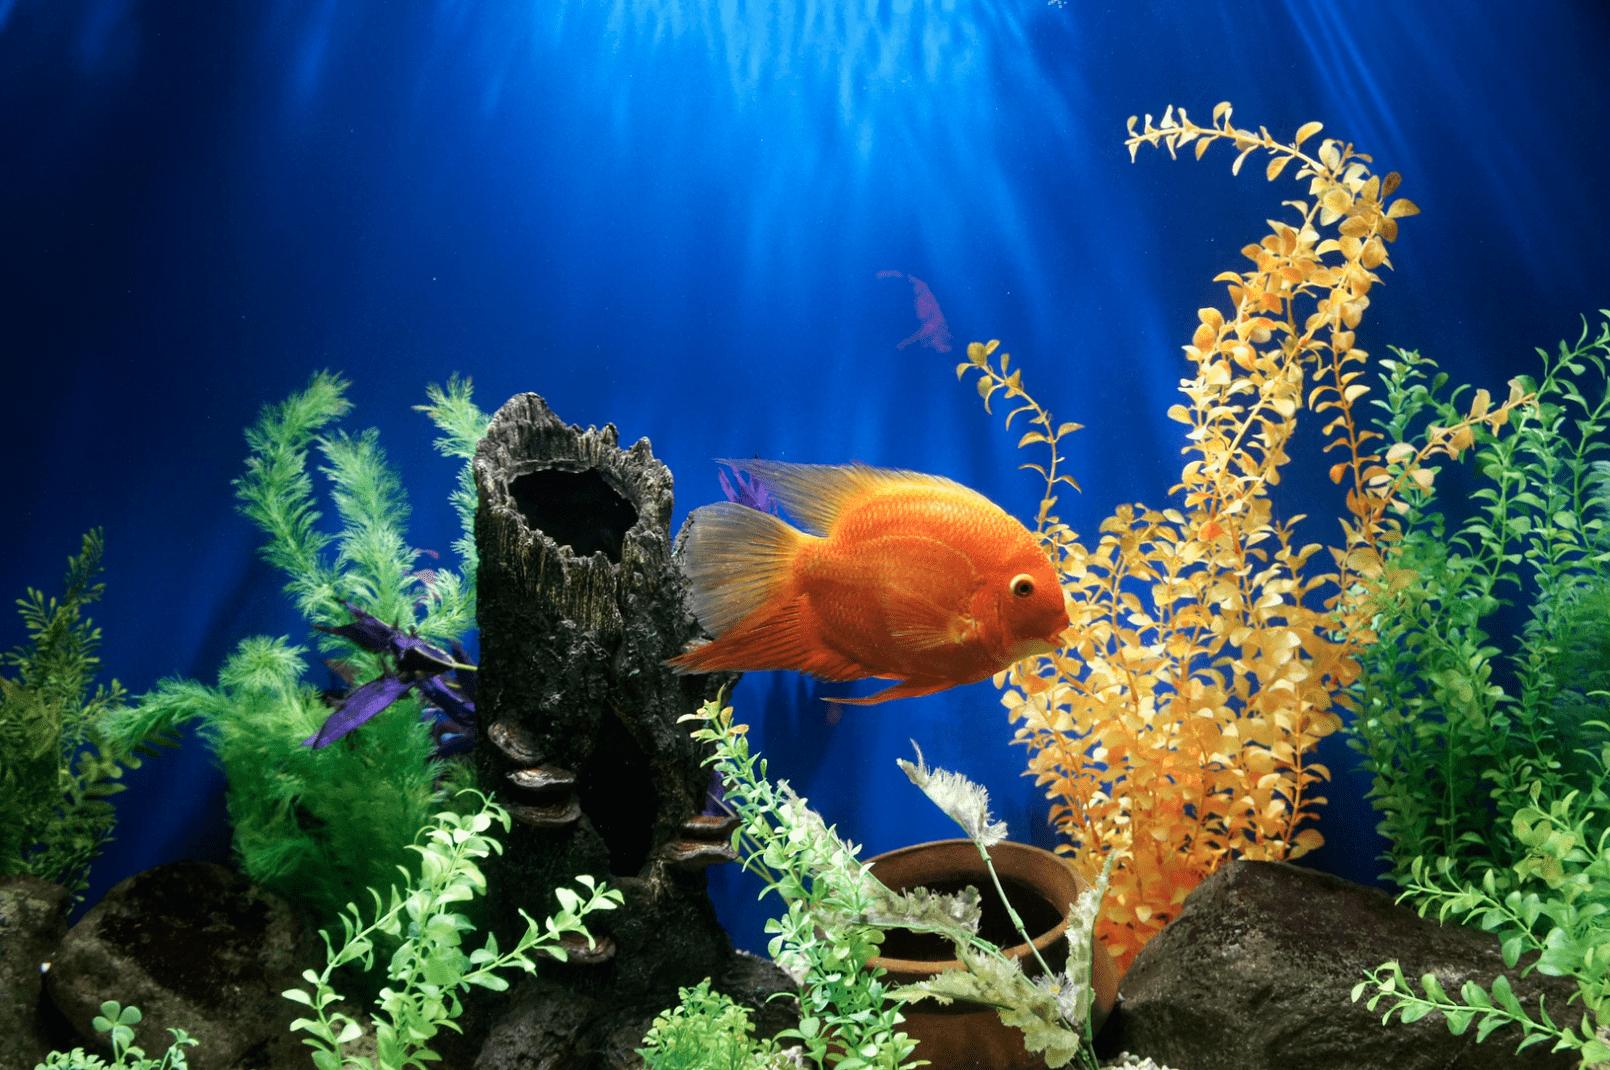 yellow fish swimming underwater with plants